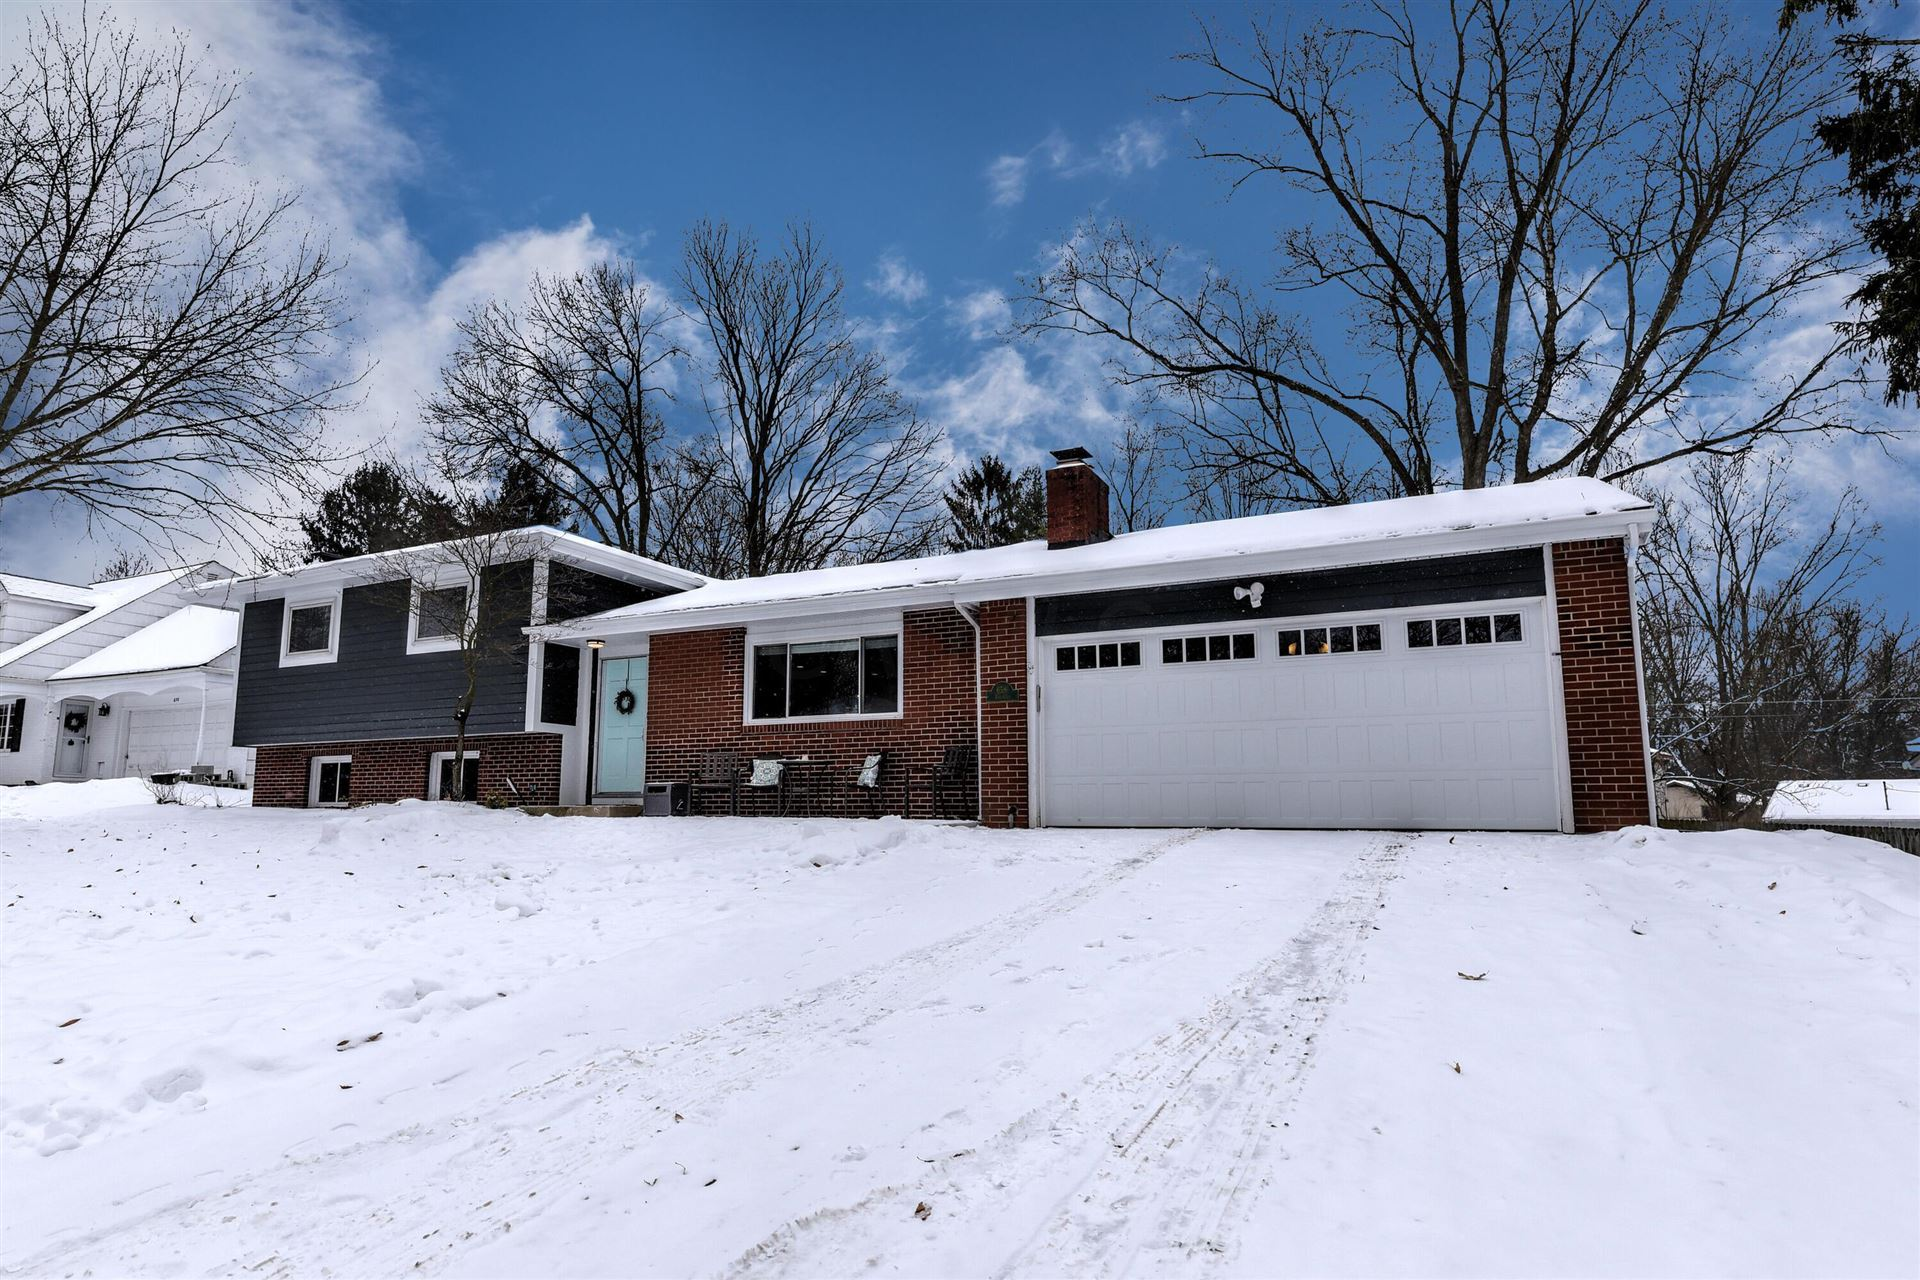 Photo of 658 Farrington Drive, Worthington, OH 43085 (MLS # 221004359)